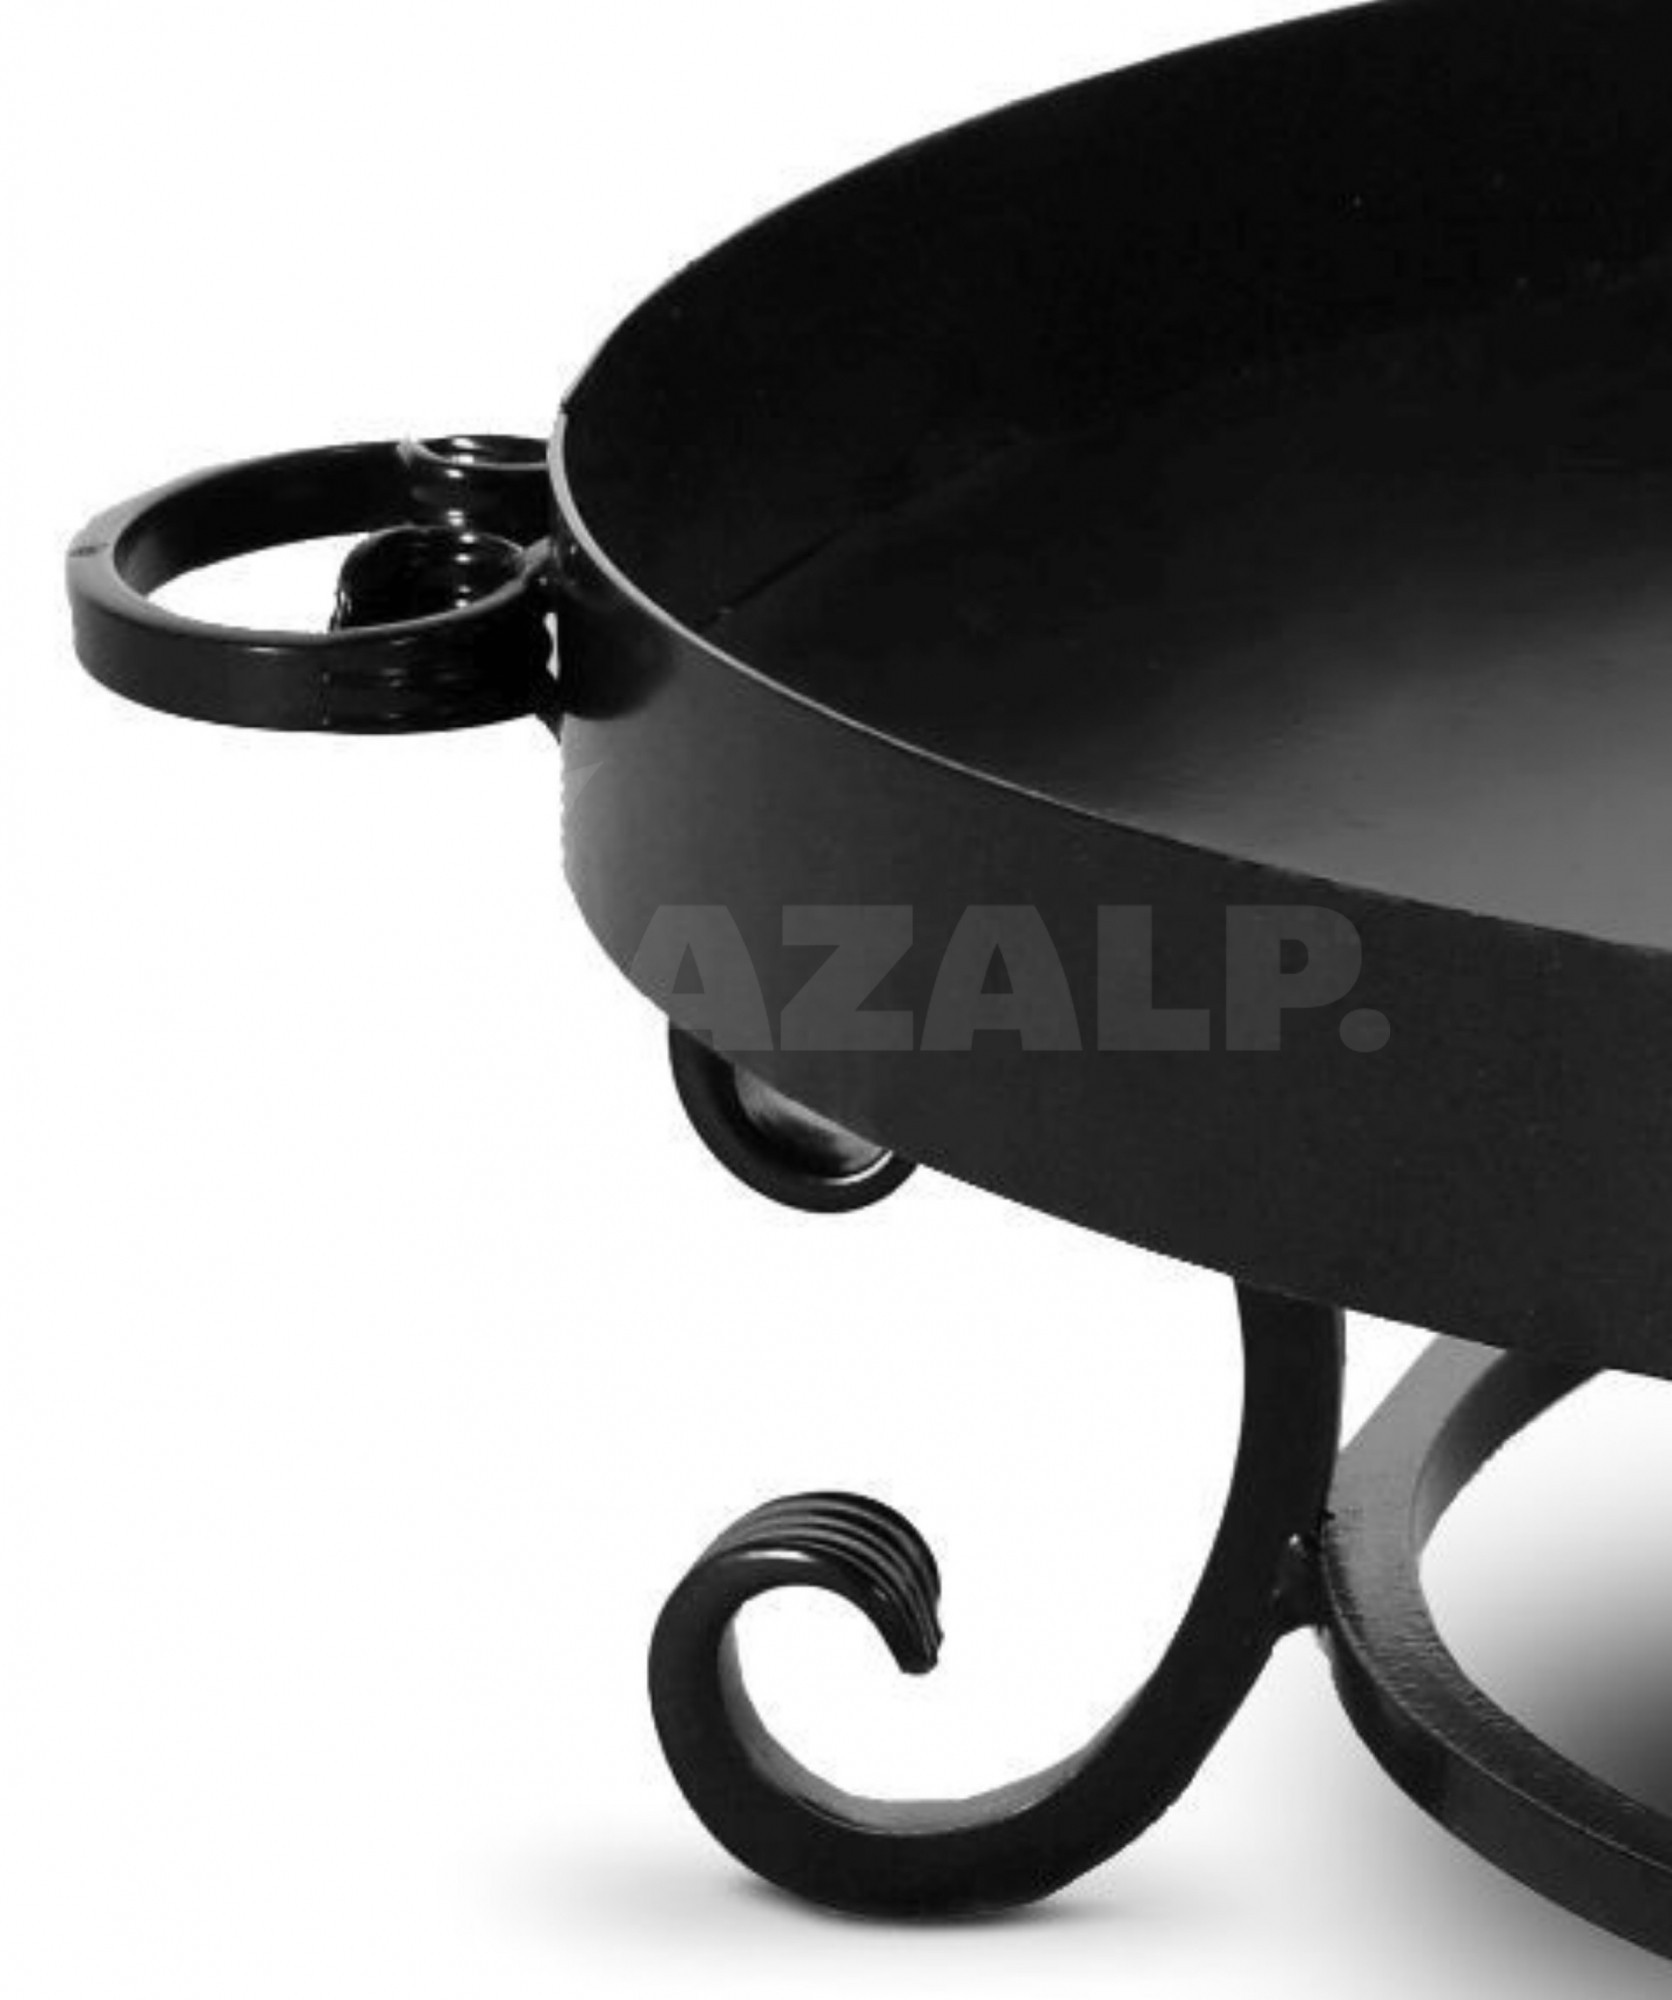 farmcook schwenkgrill viking 70 cm feuerschale pan32 80 cm kaufen bei. Black Bedroom Furniture Sets. Home Design Ideas